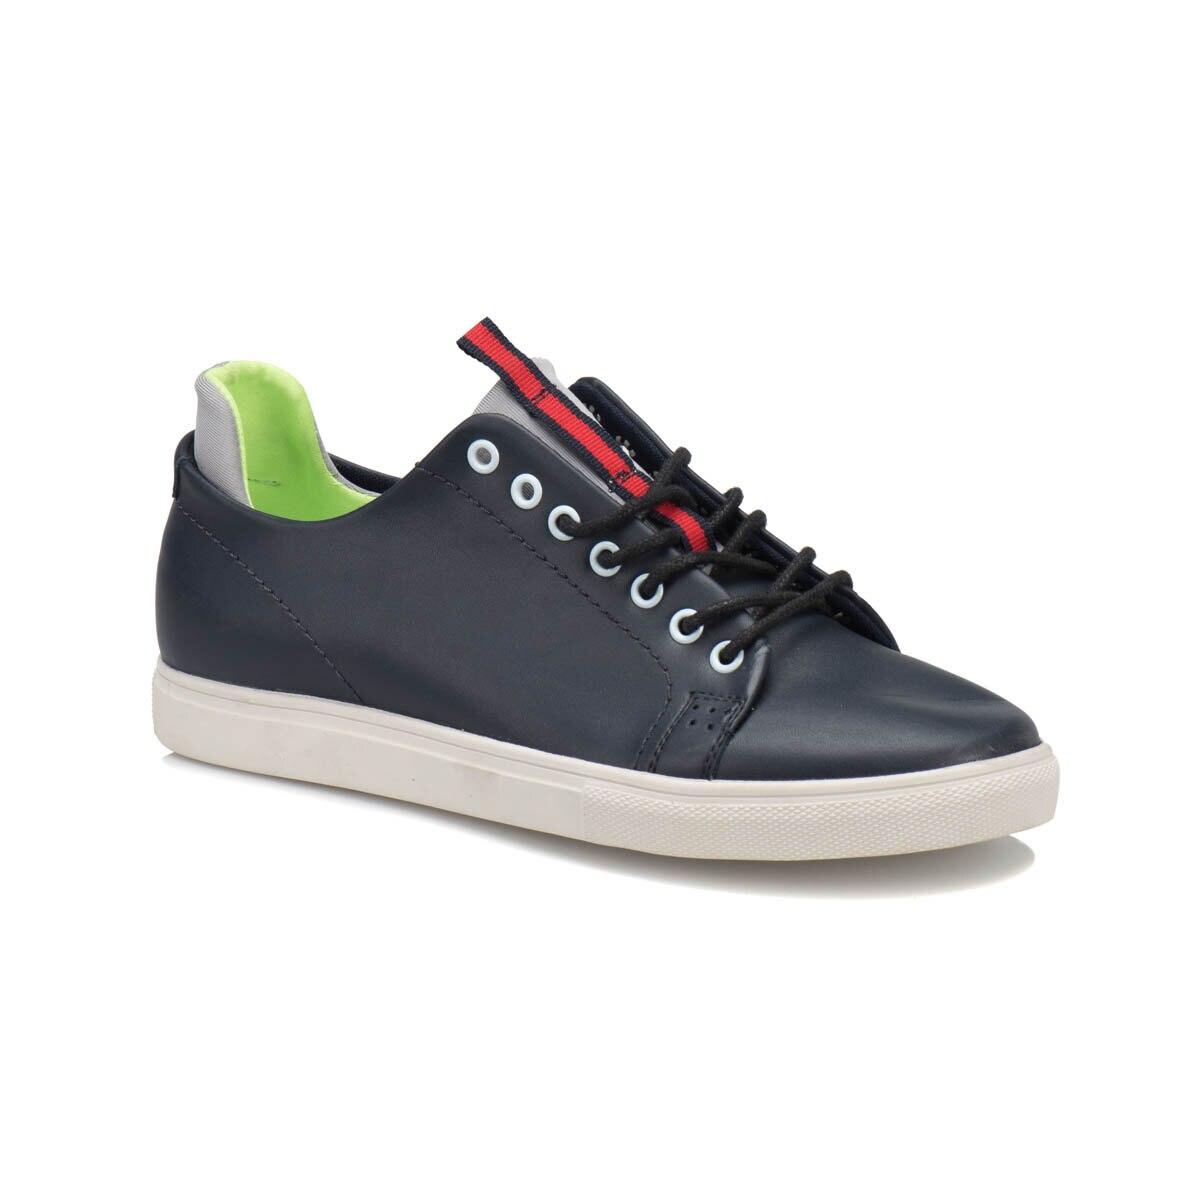 FLO 118-1 M Navy Blue Men 'S Sneaker Shoes Forester